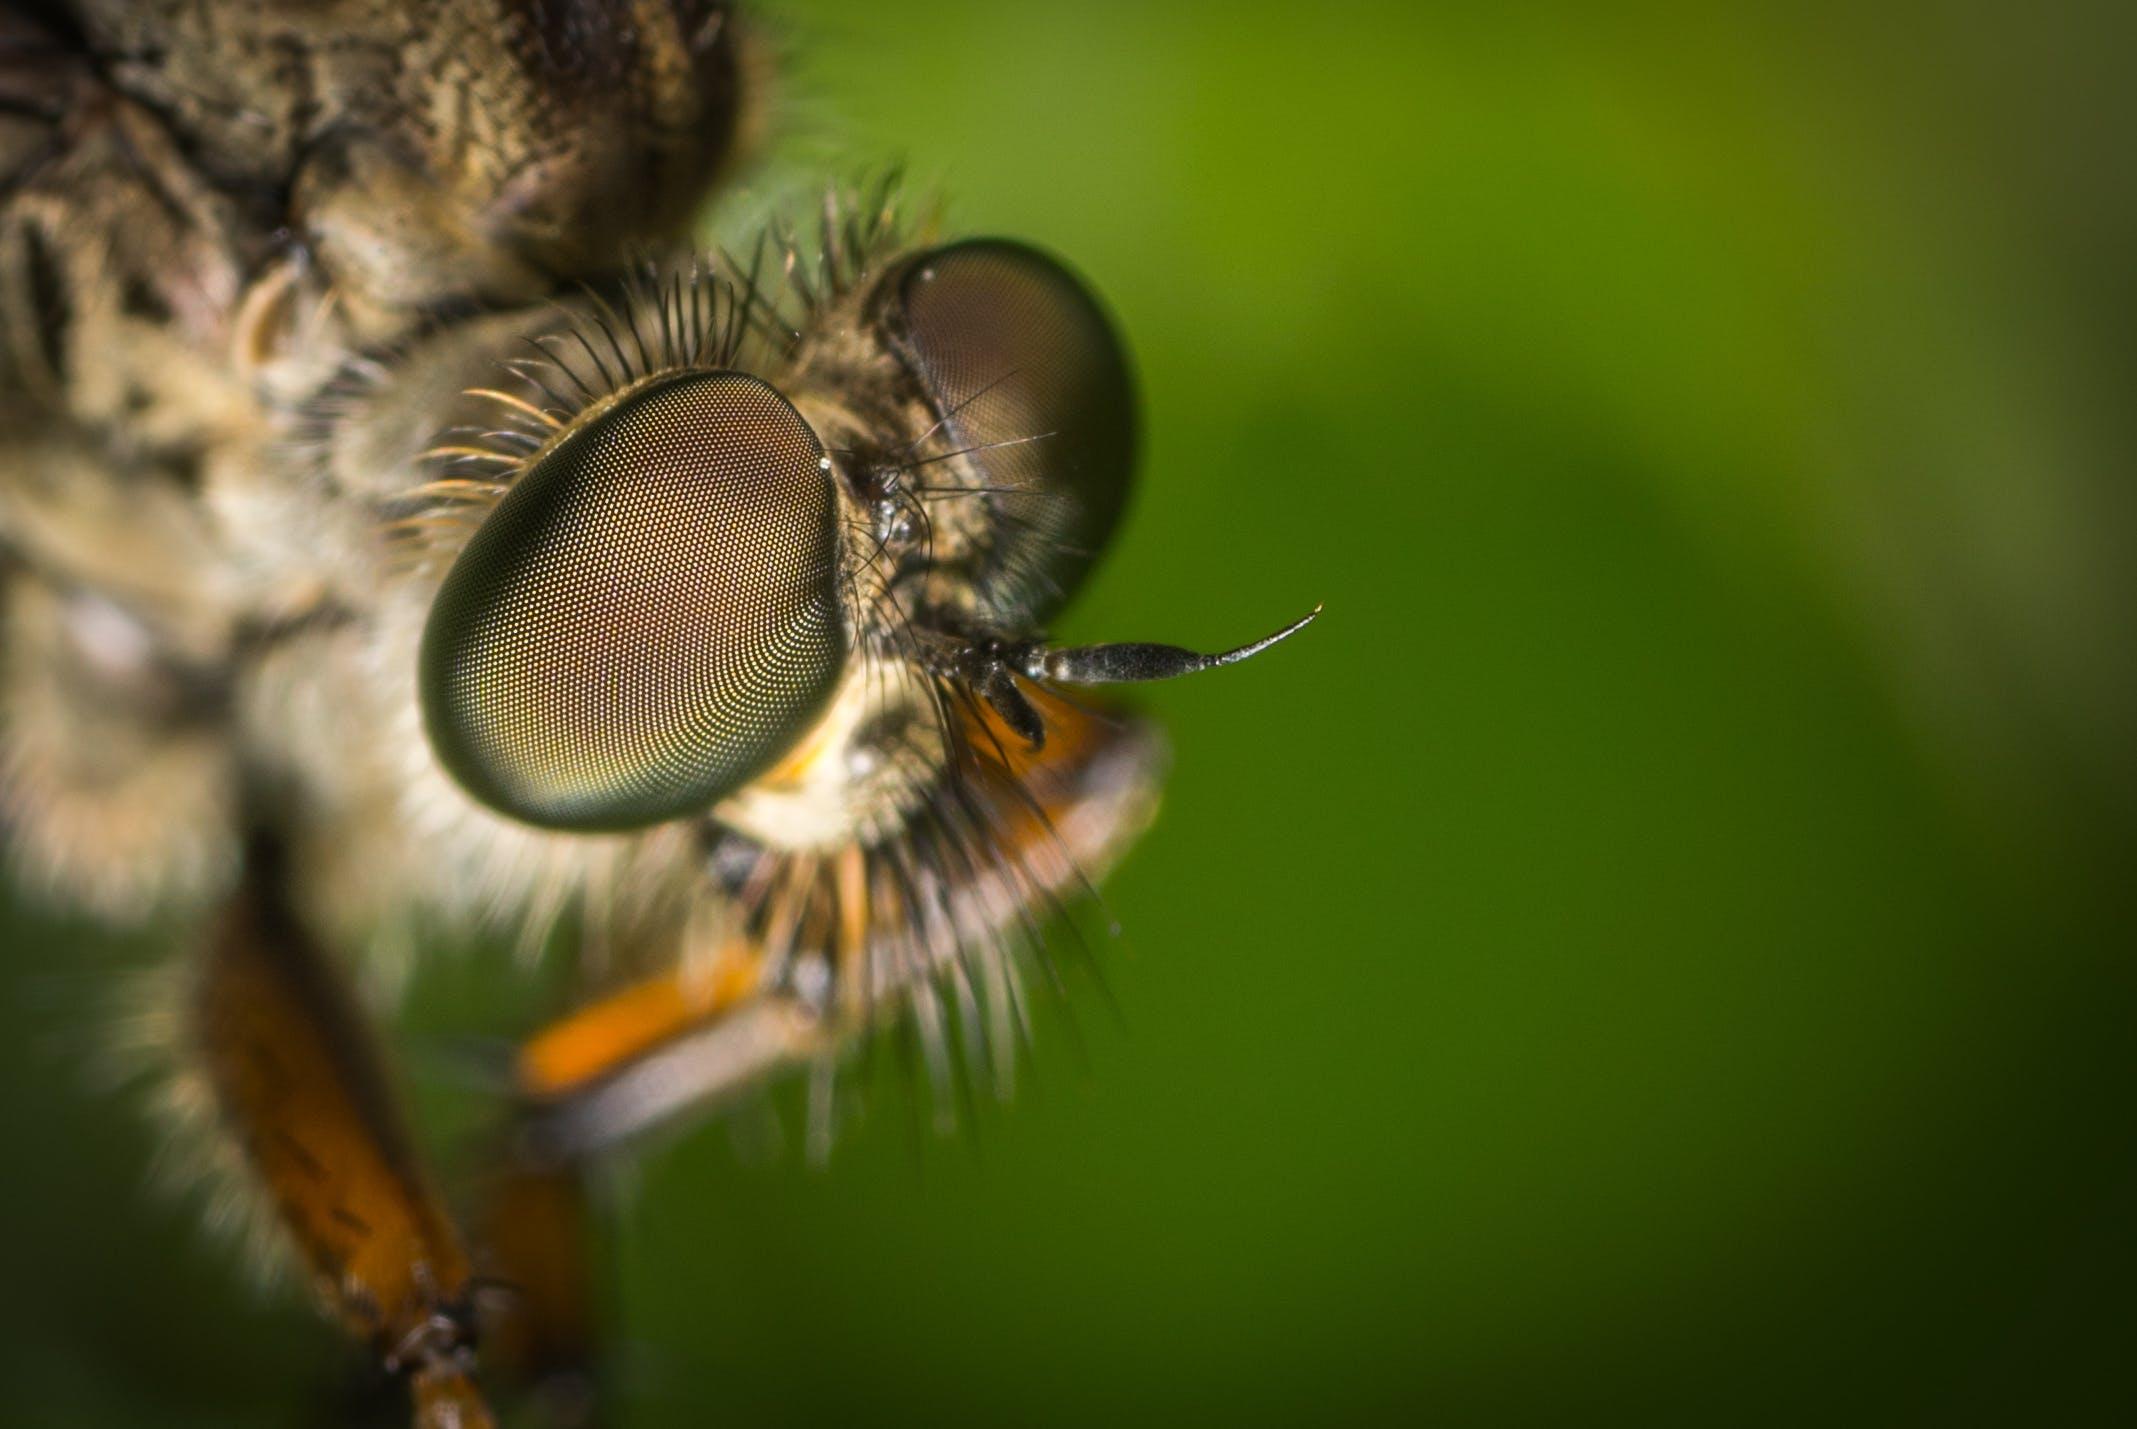 Macro Photography Of Fly